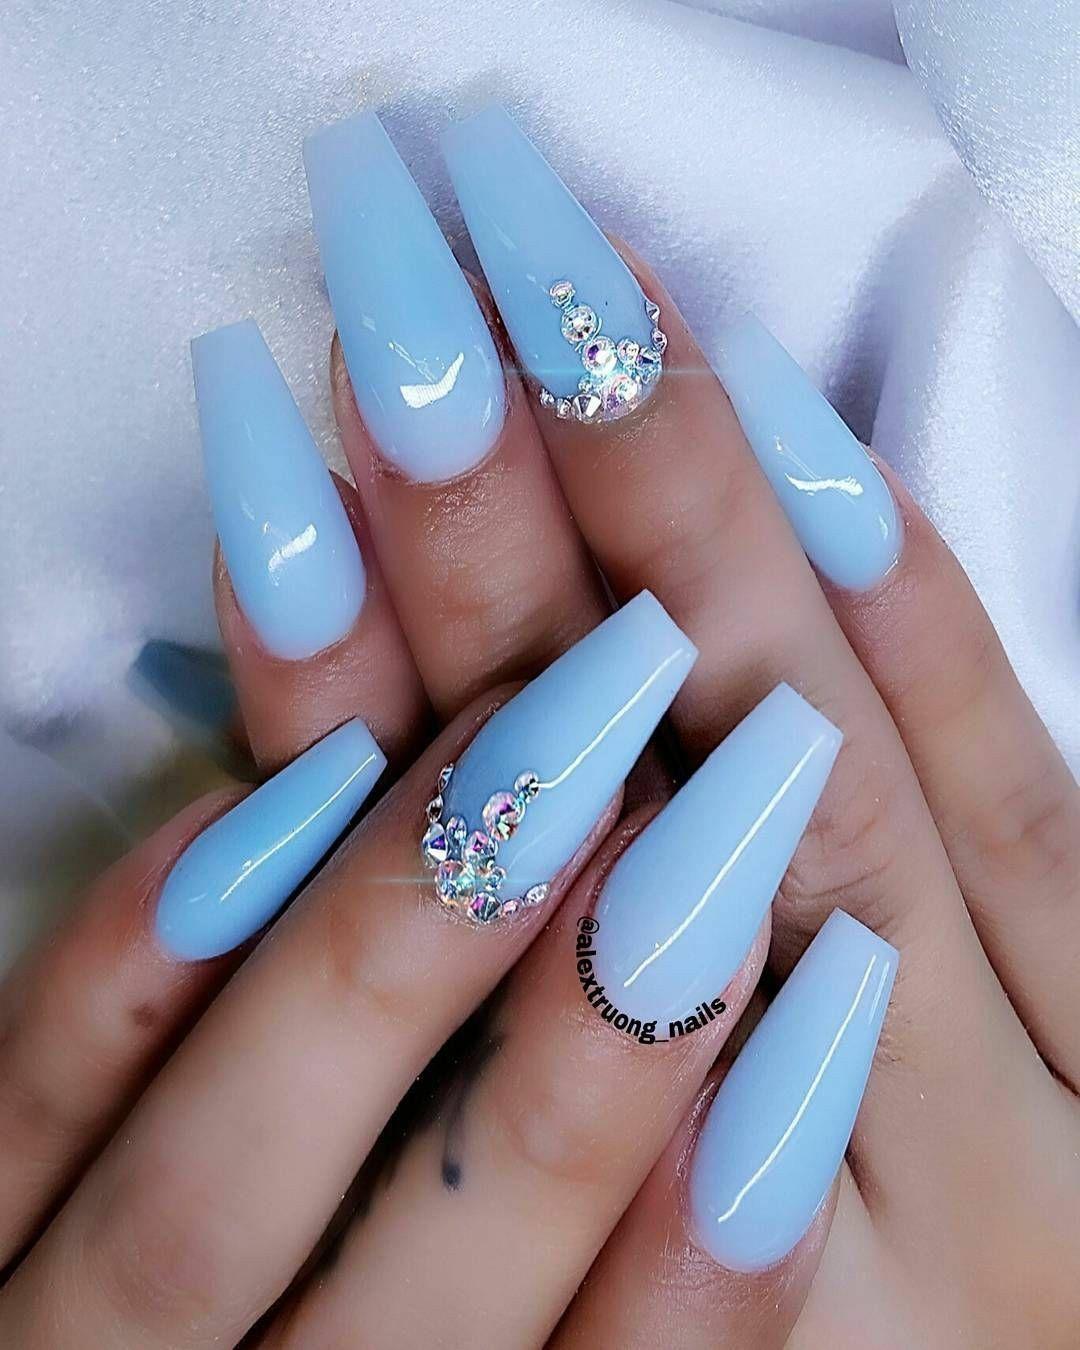 Ballerina Nails Spring Nails Baby Blue Nails Nails With Rhinestones Acrylic Nails Blue Gel Nails Blue Coffin Nails Blue Acrylic Nails